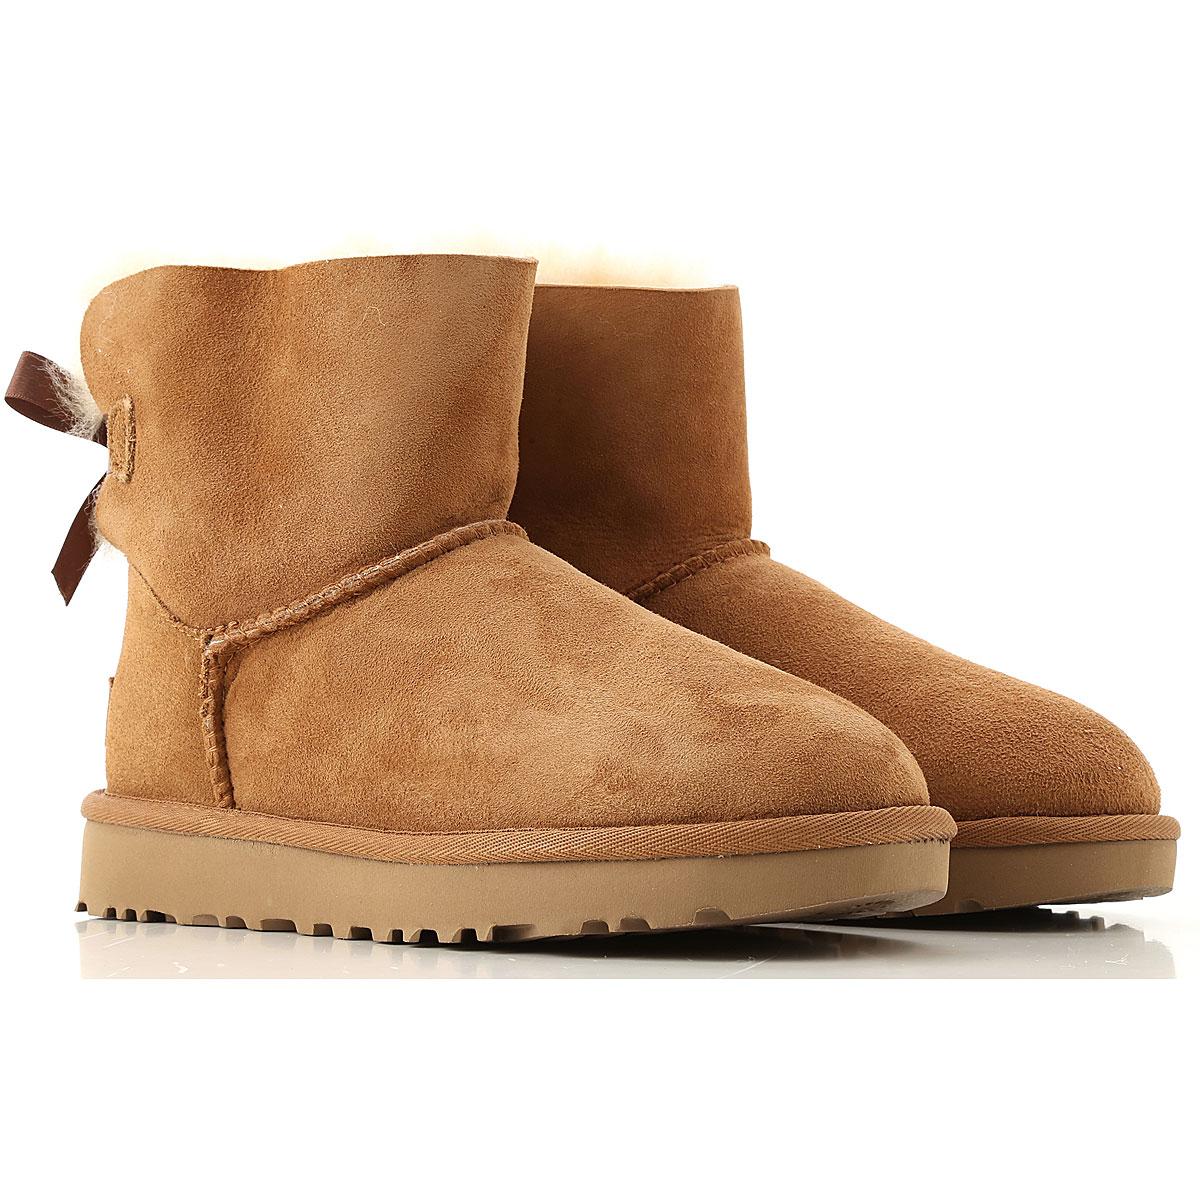 UGG Boots for Women, Booties On Sale, Chestnut, Suede leather, 2019, USA 7 UK 5 5 EU 38 JAPAN 240 USA 9 UK 7 5 EU 40 JAPAN 260